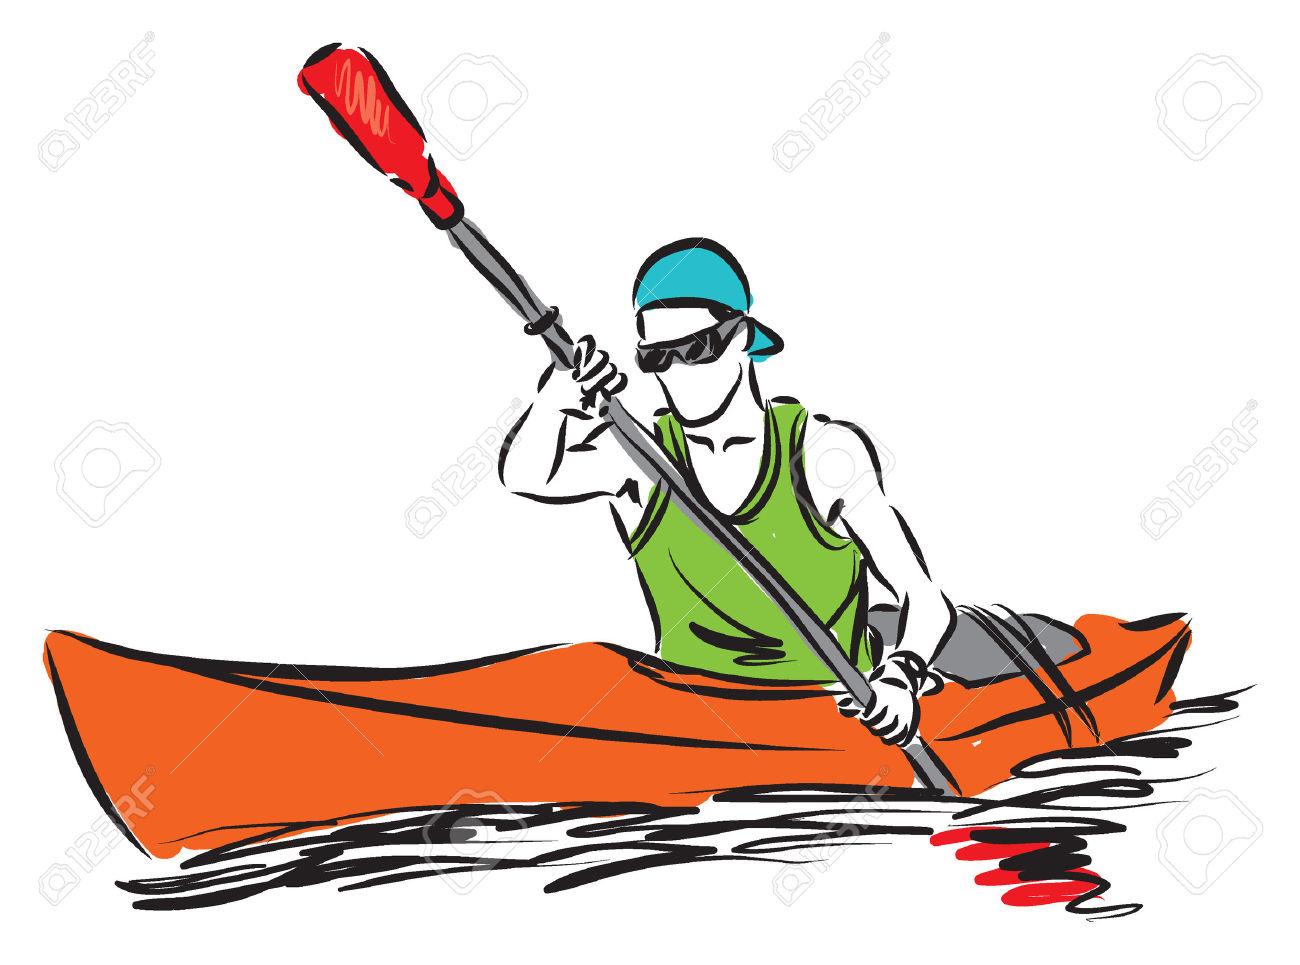 Kayaking cliparts free download. Boating clipart kayak